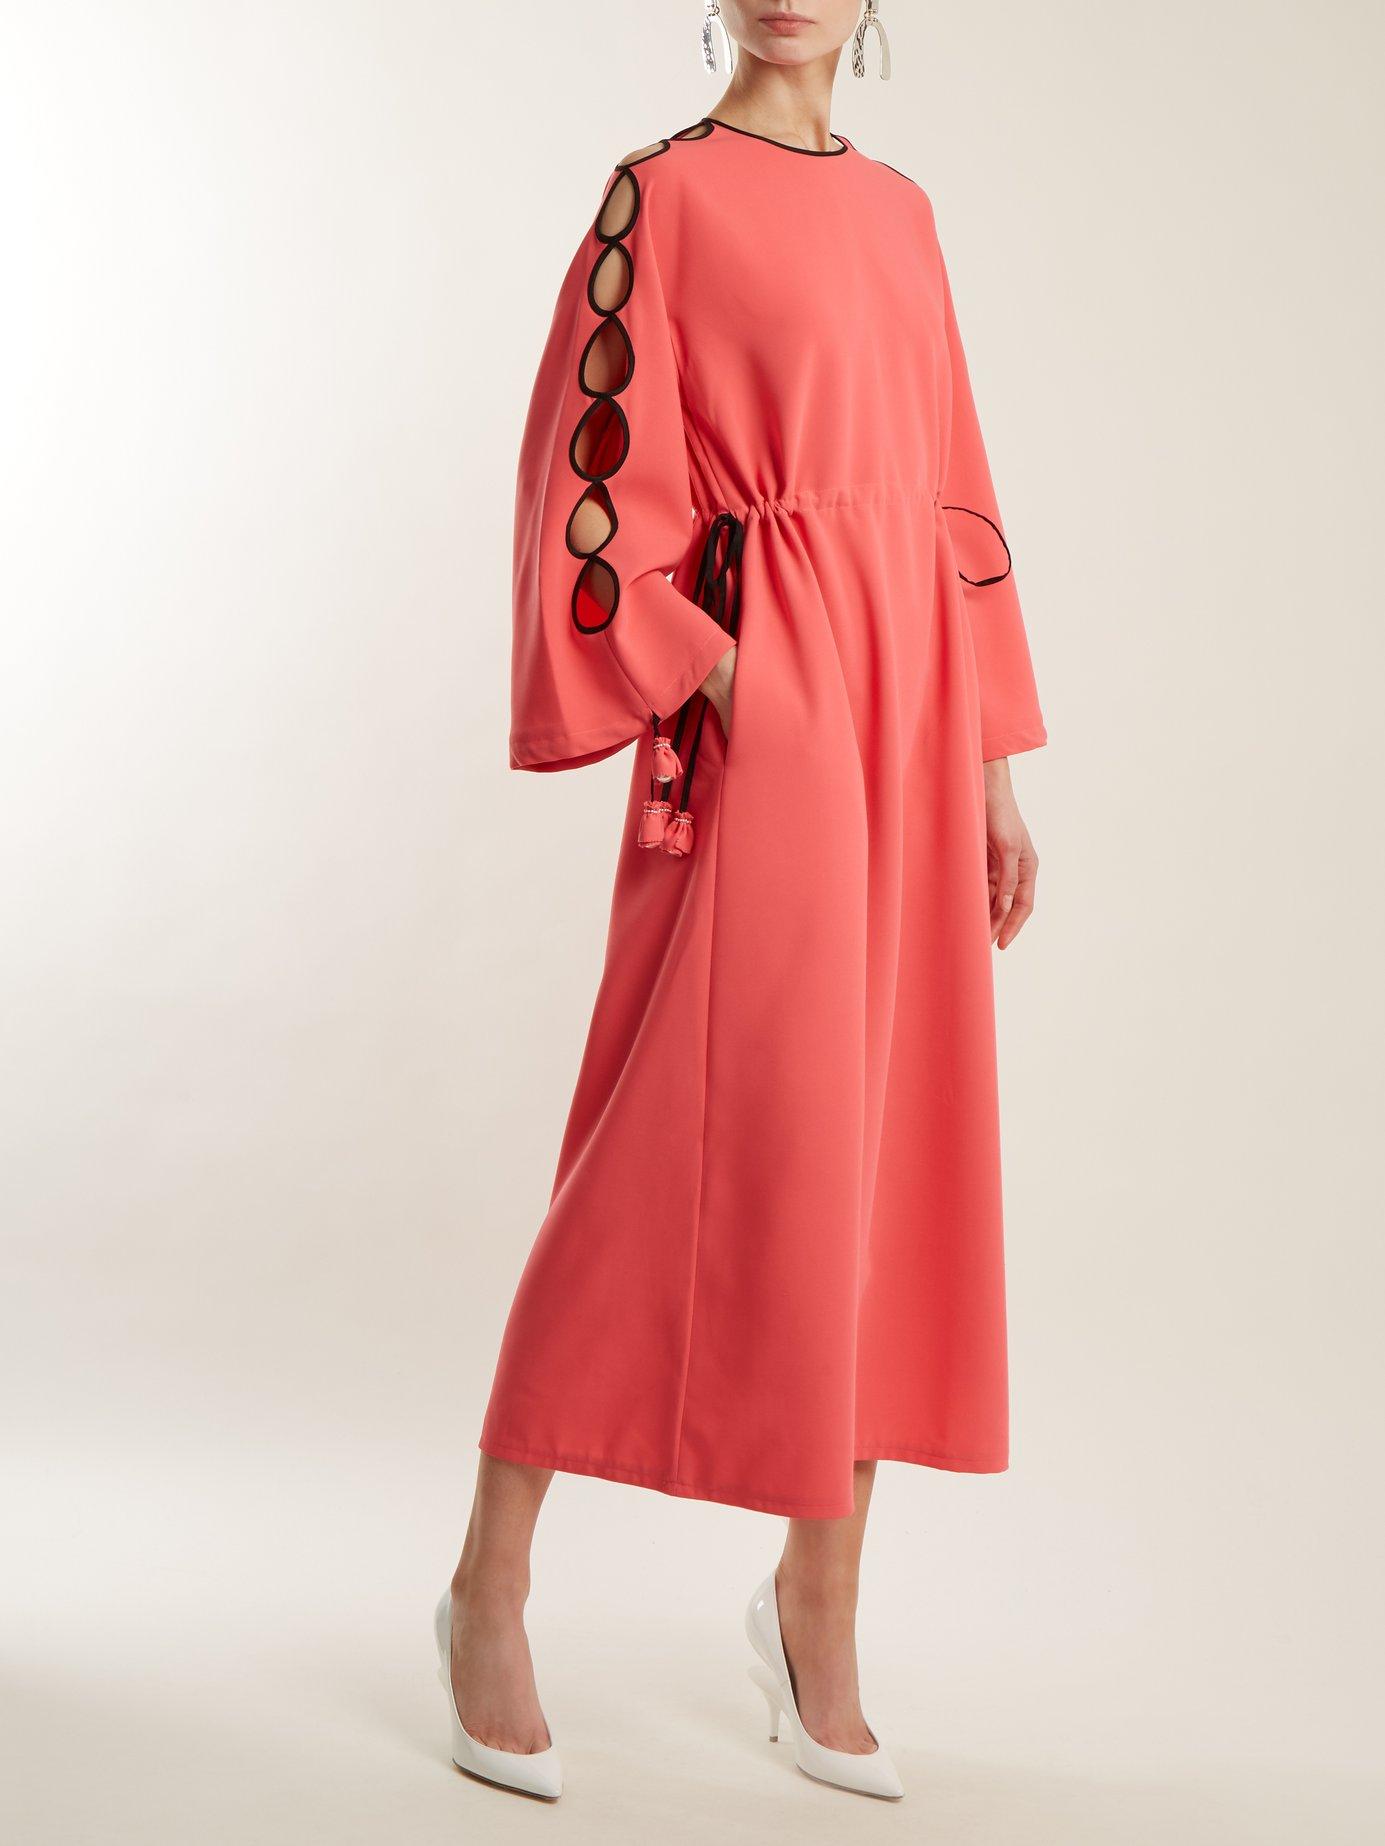 Drawstring-waist cut-out detail midi dress by Huishan Zhang